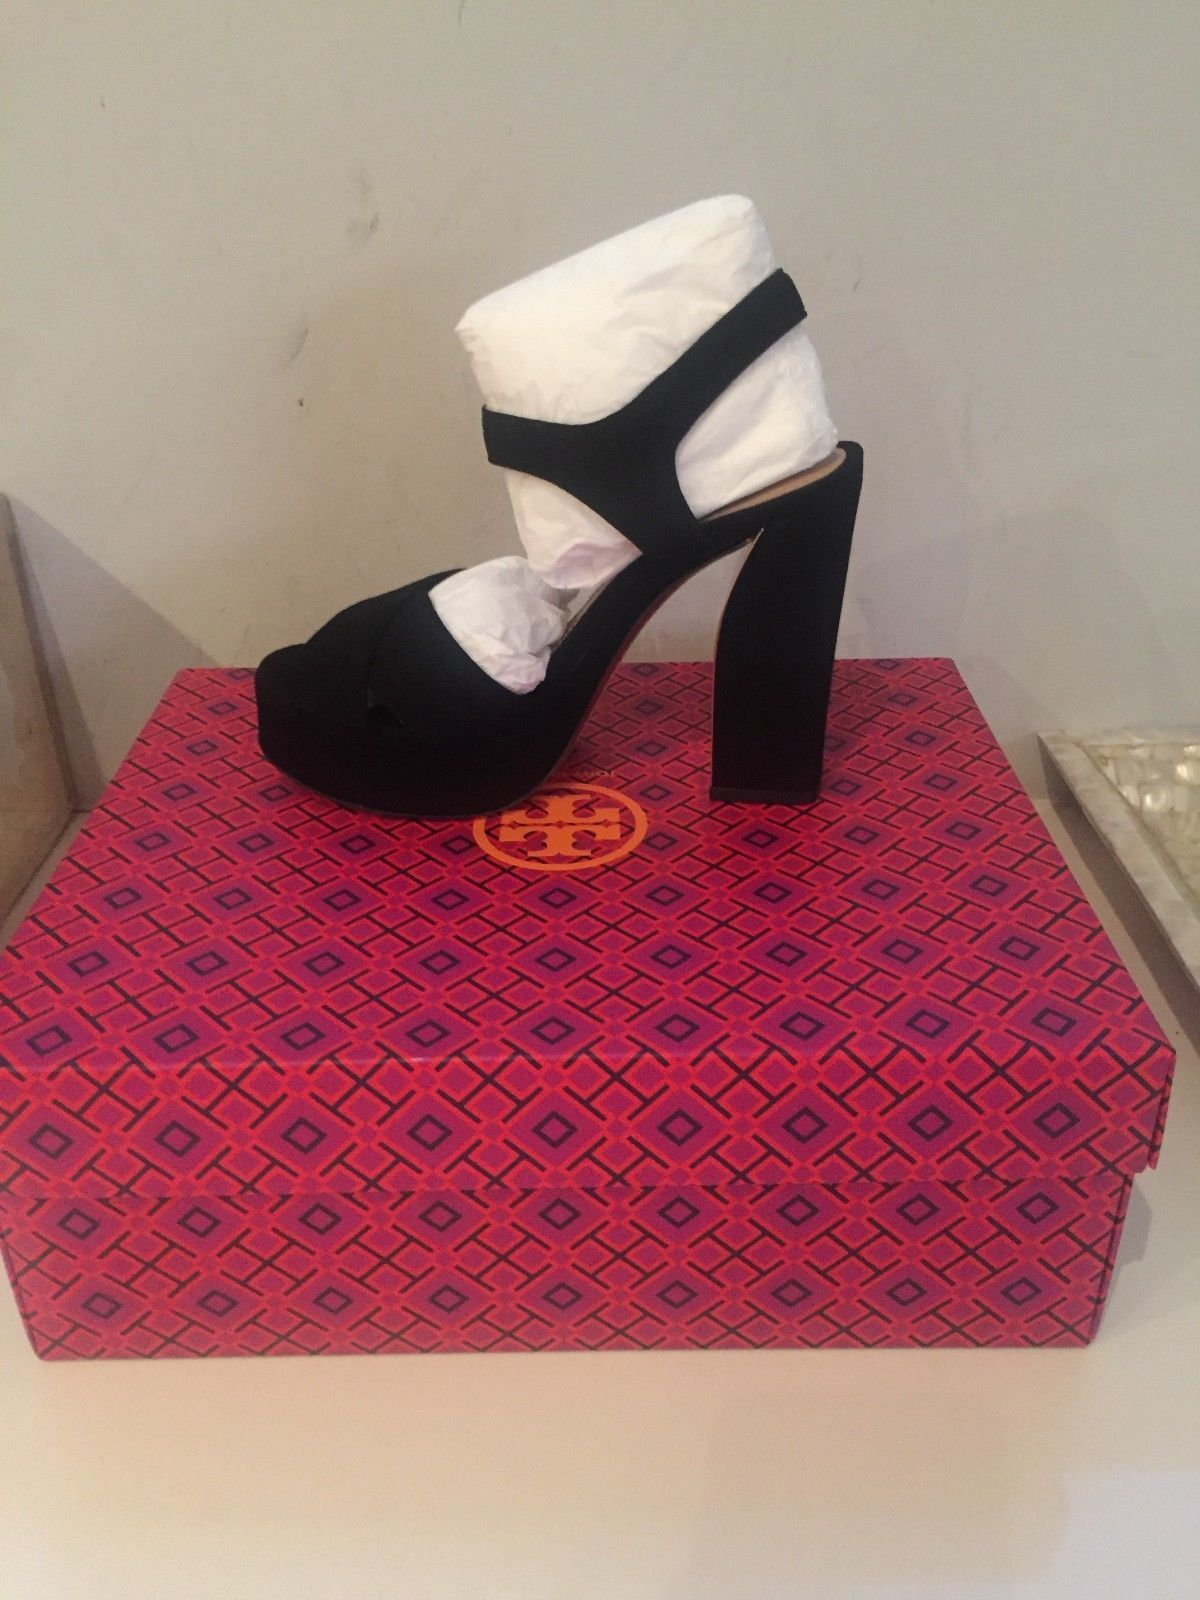 2cb427e1113b1 Tory Burch Loretta Velvet Platform Sandal - Size 6 - Black ...